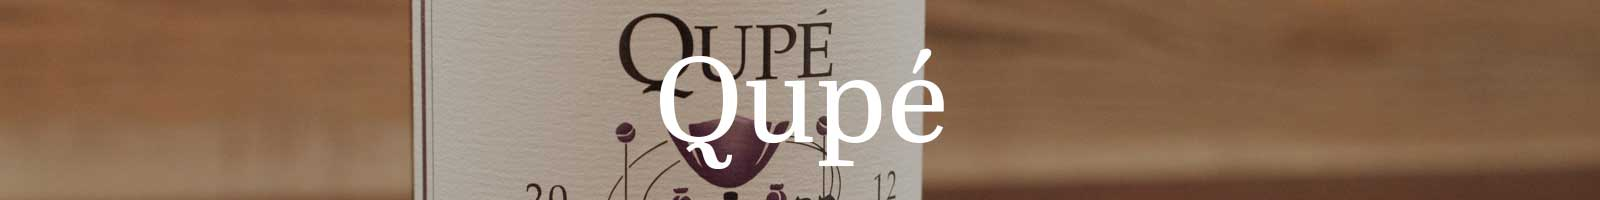 Essential Winemakers of California - Qupé